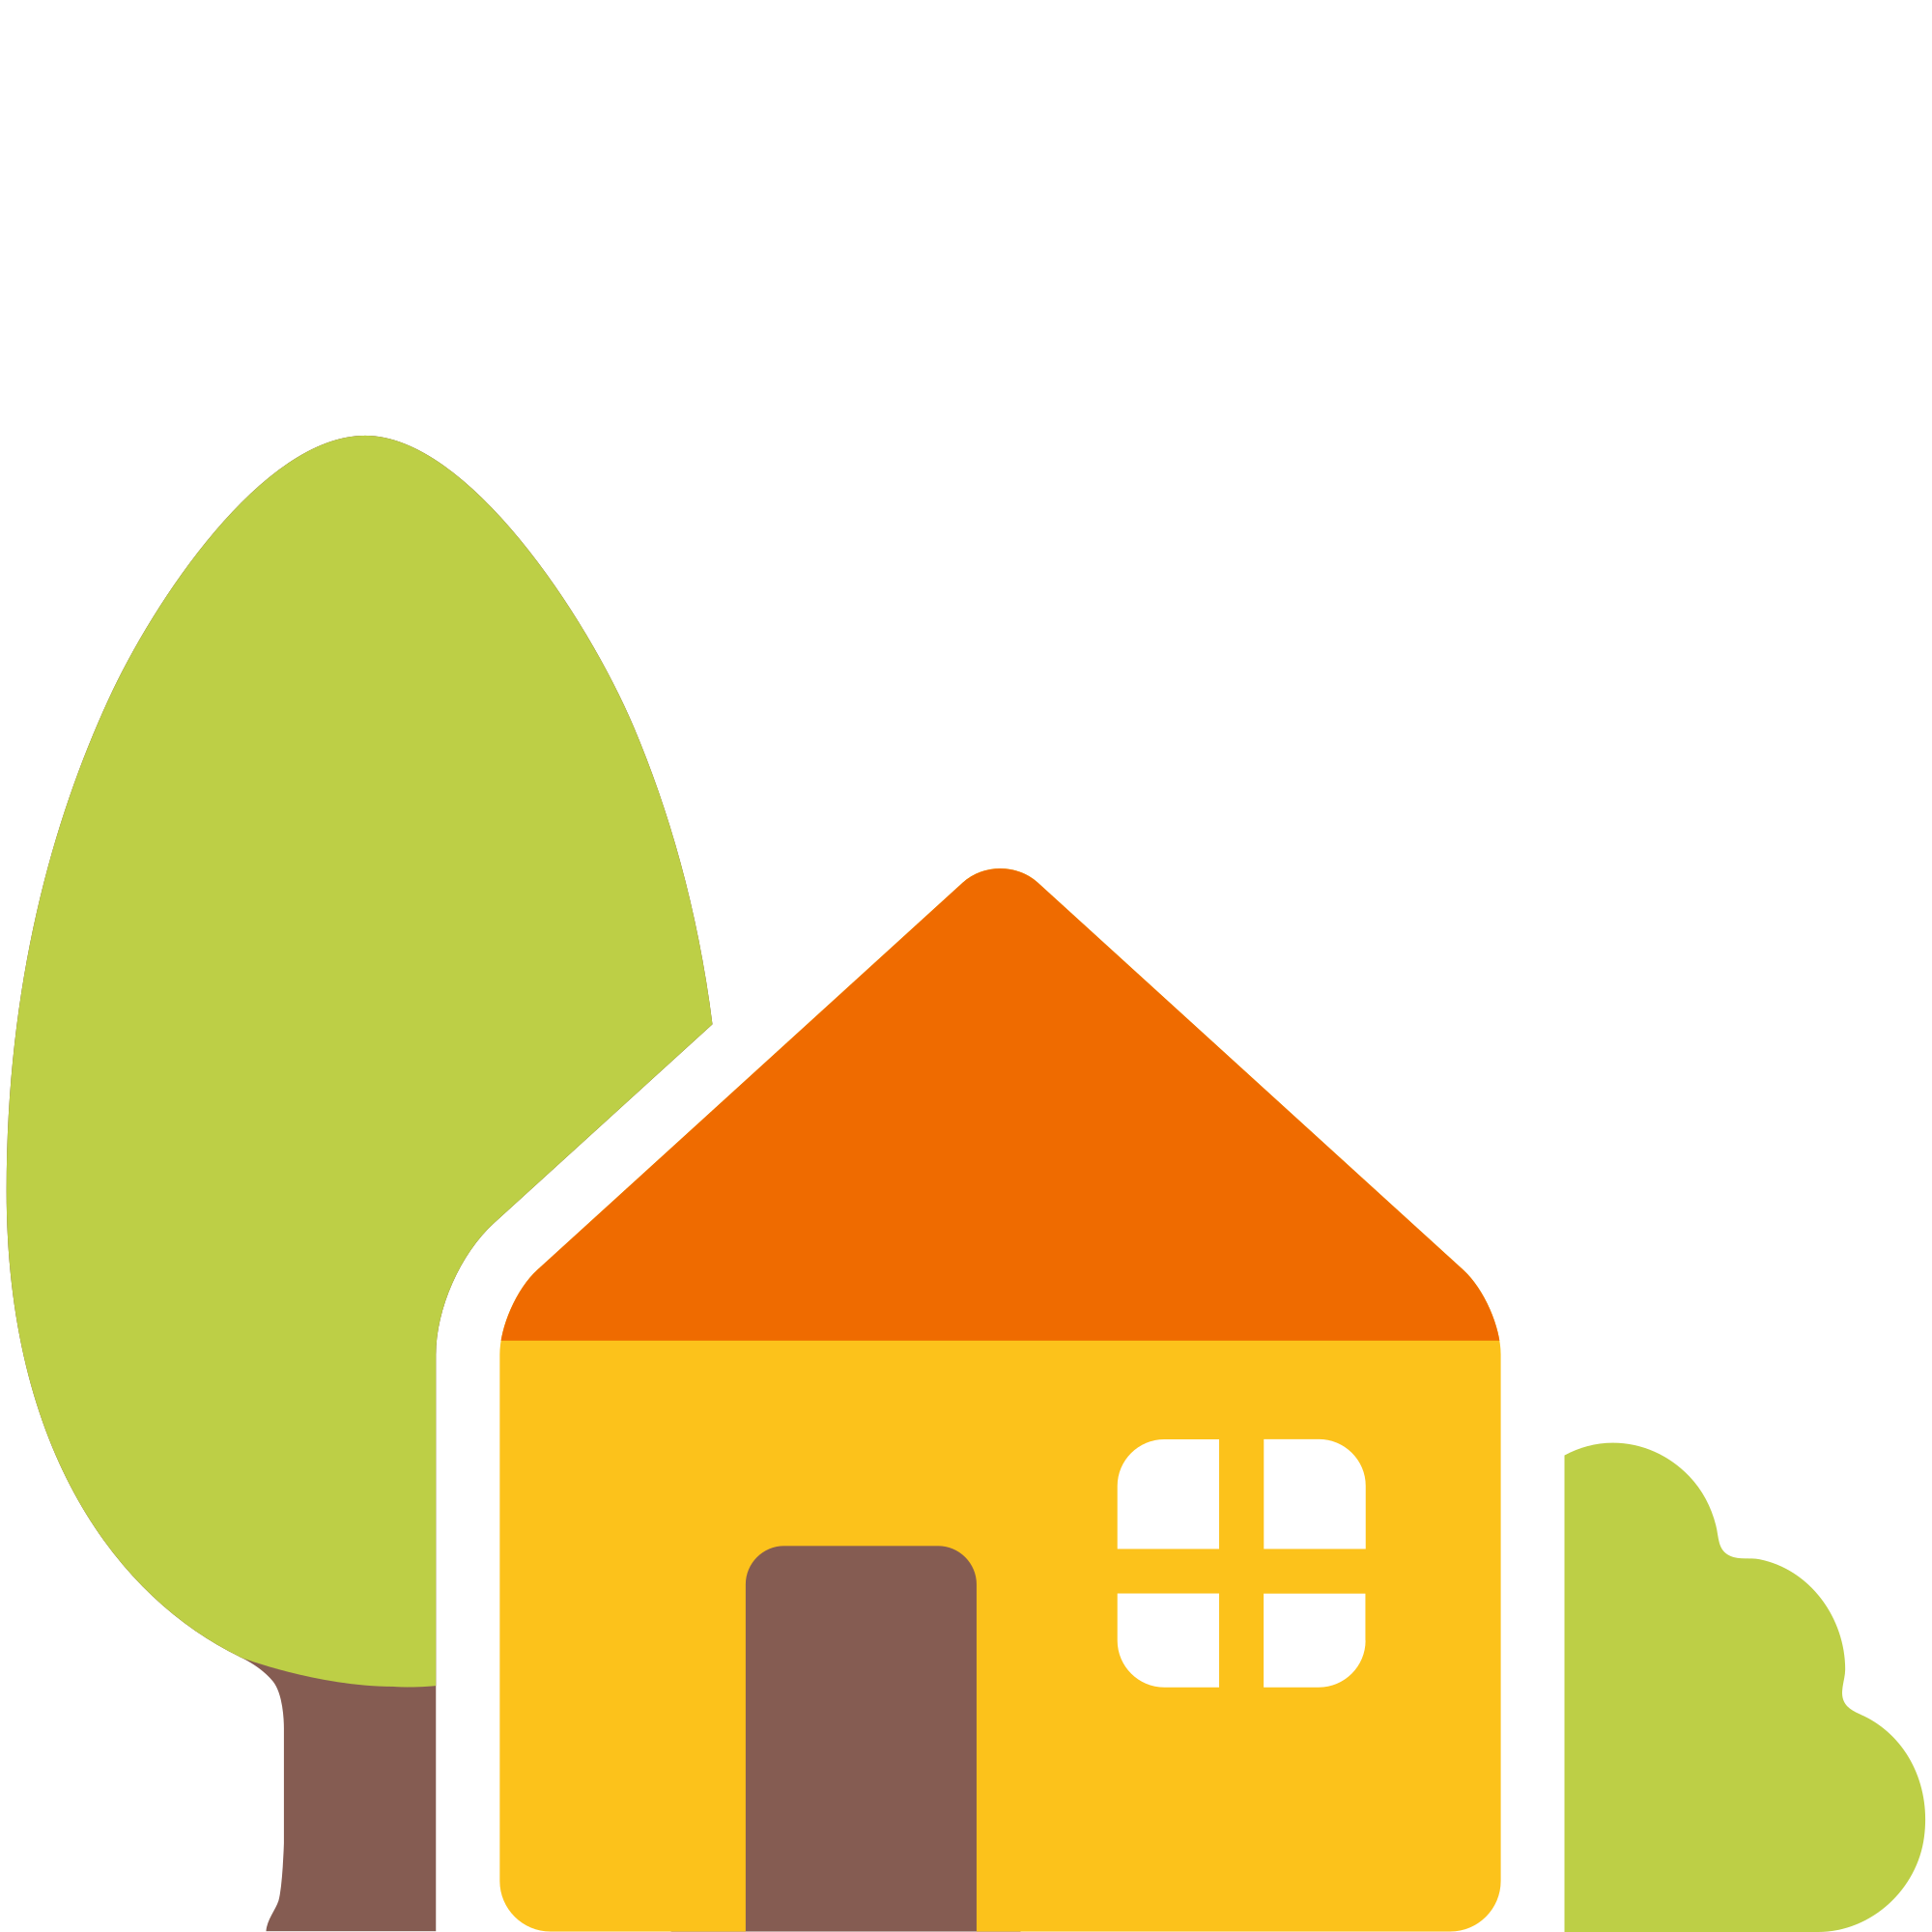 File u f e. Houses clipart emoji